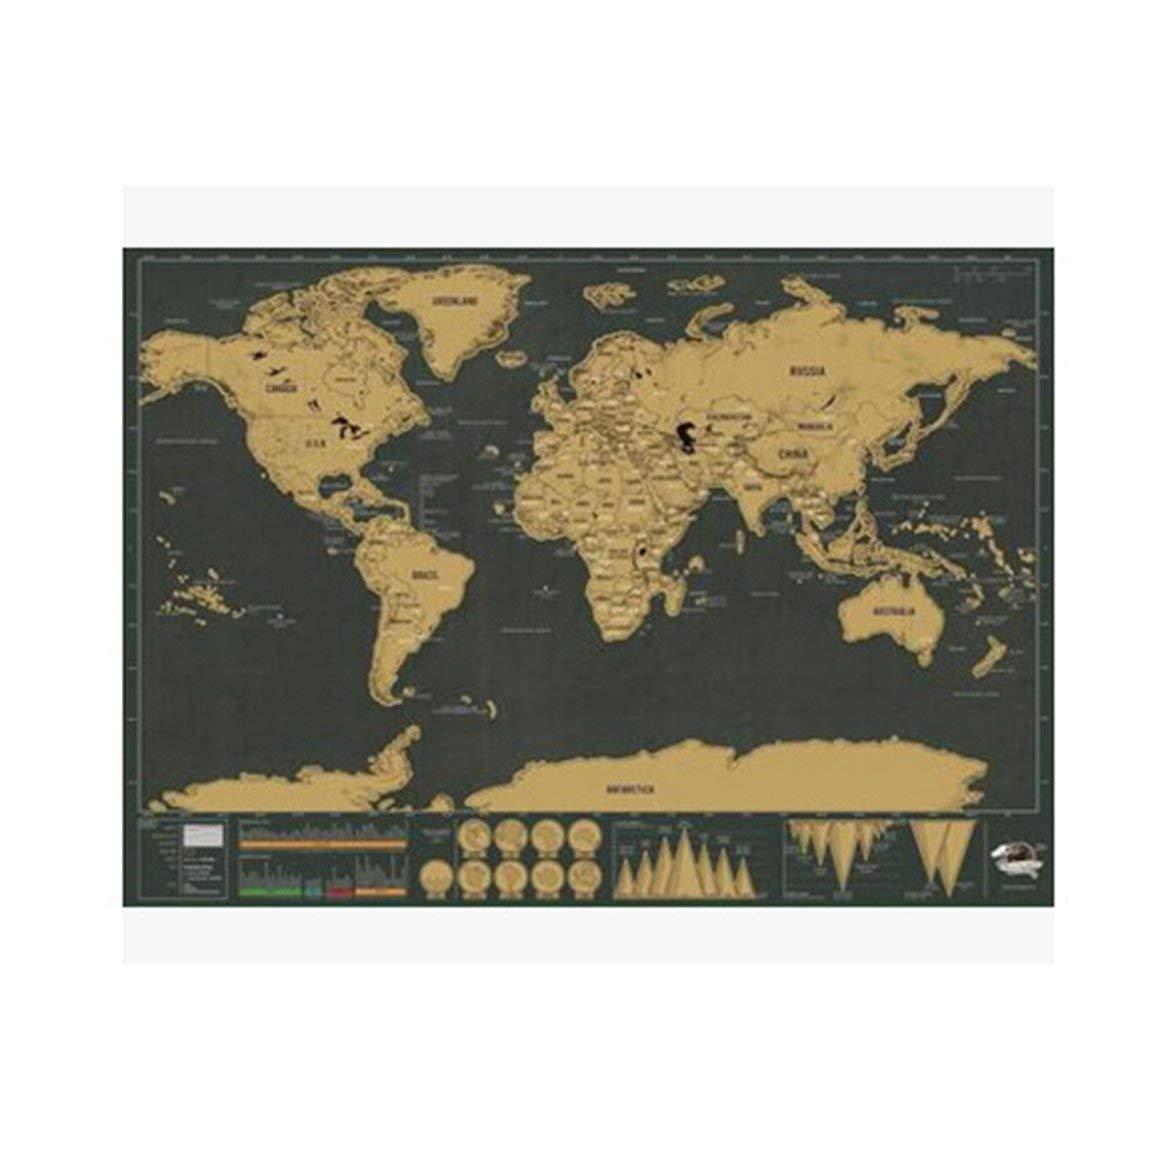 Erdkunde Karten Gre: L Scratch Map Weltkarte Semi-manual Hanging ...